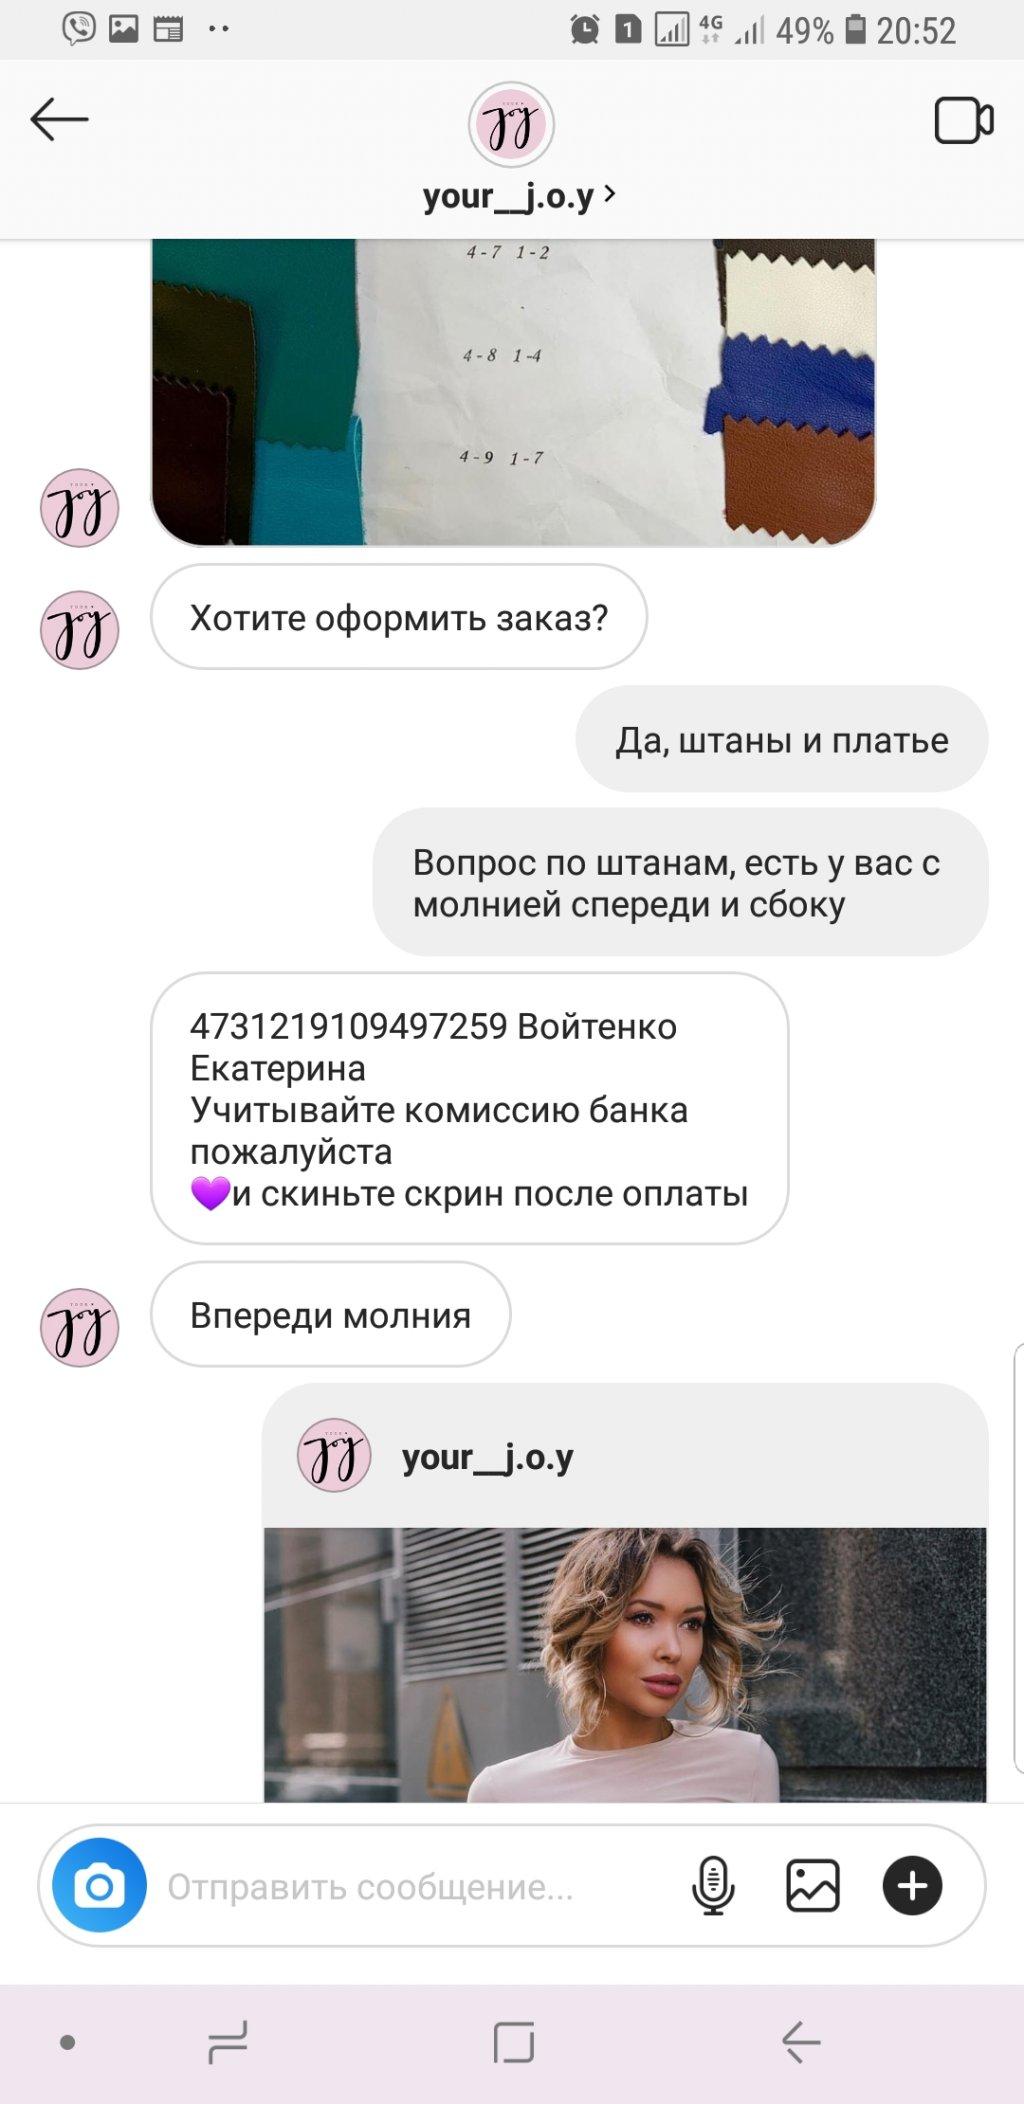 Your joy - Your joy